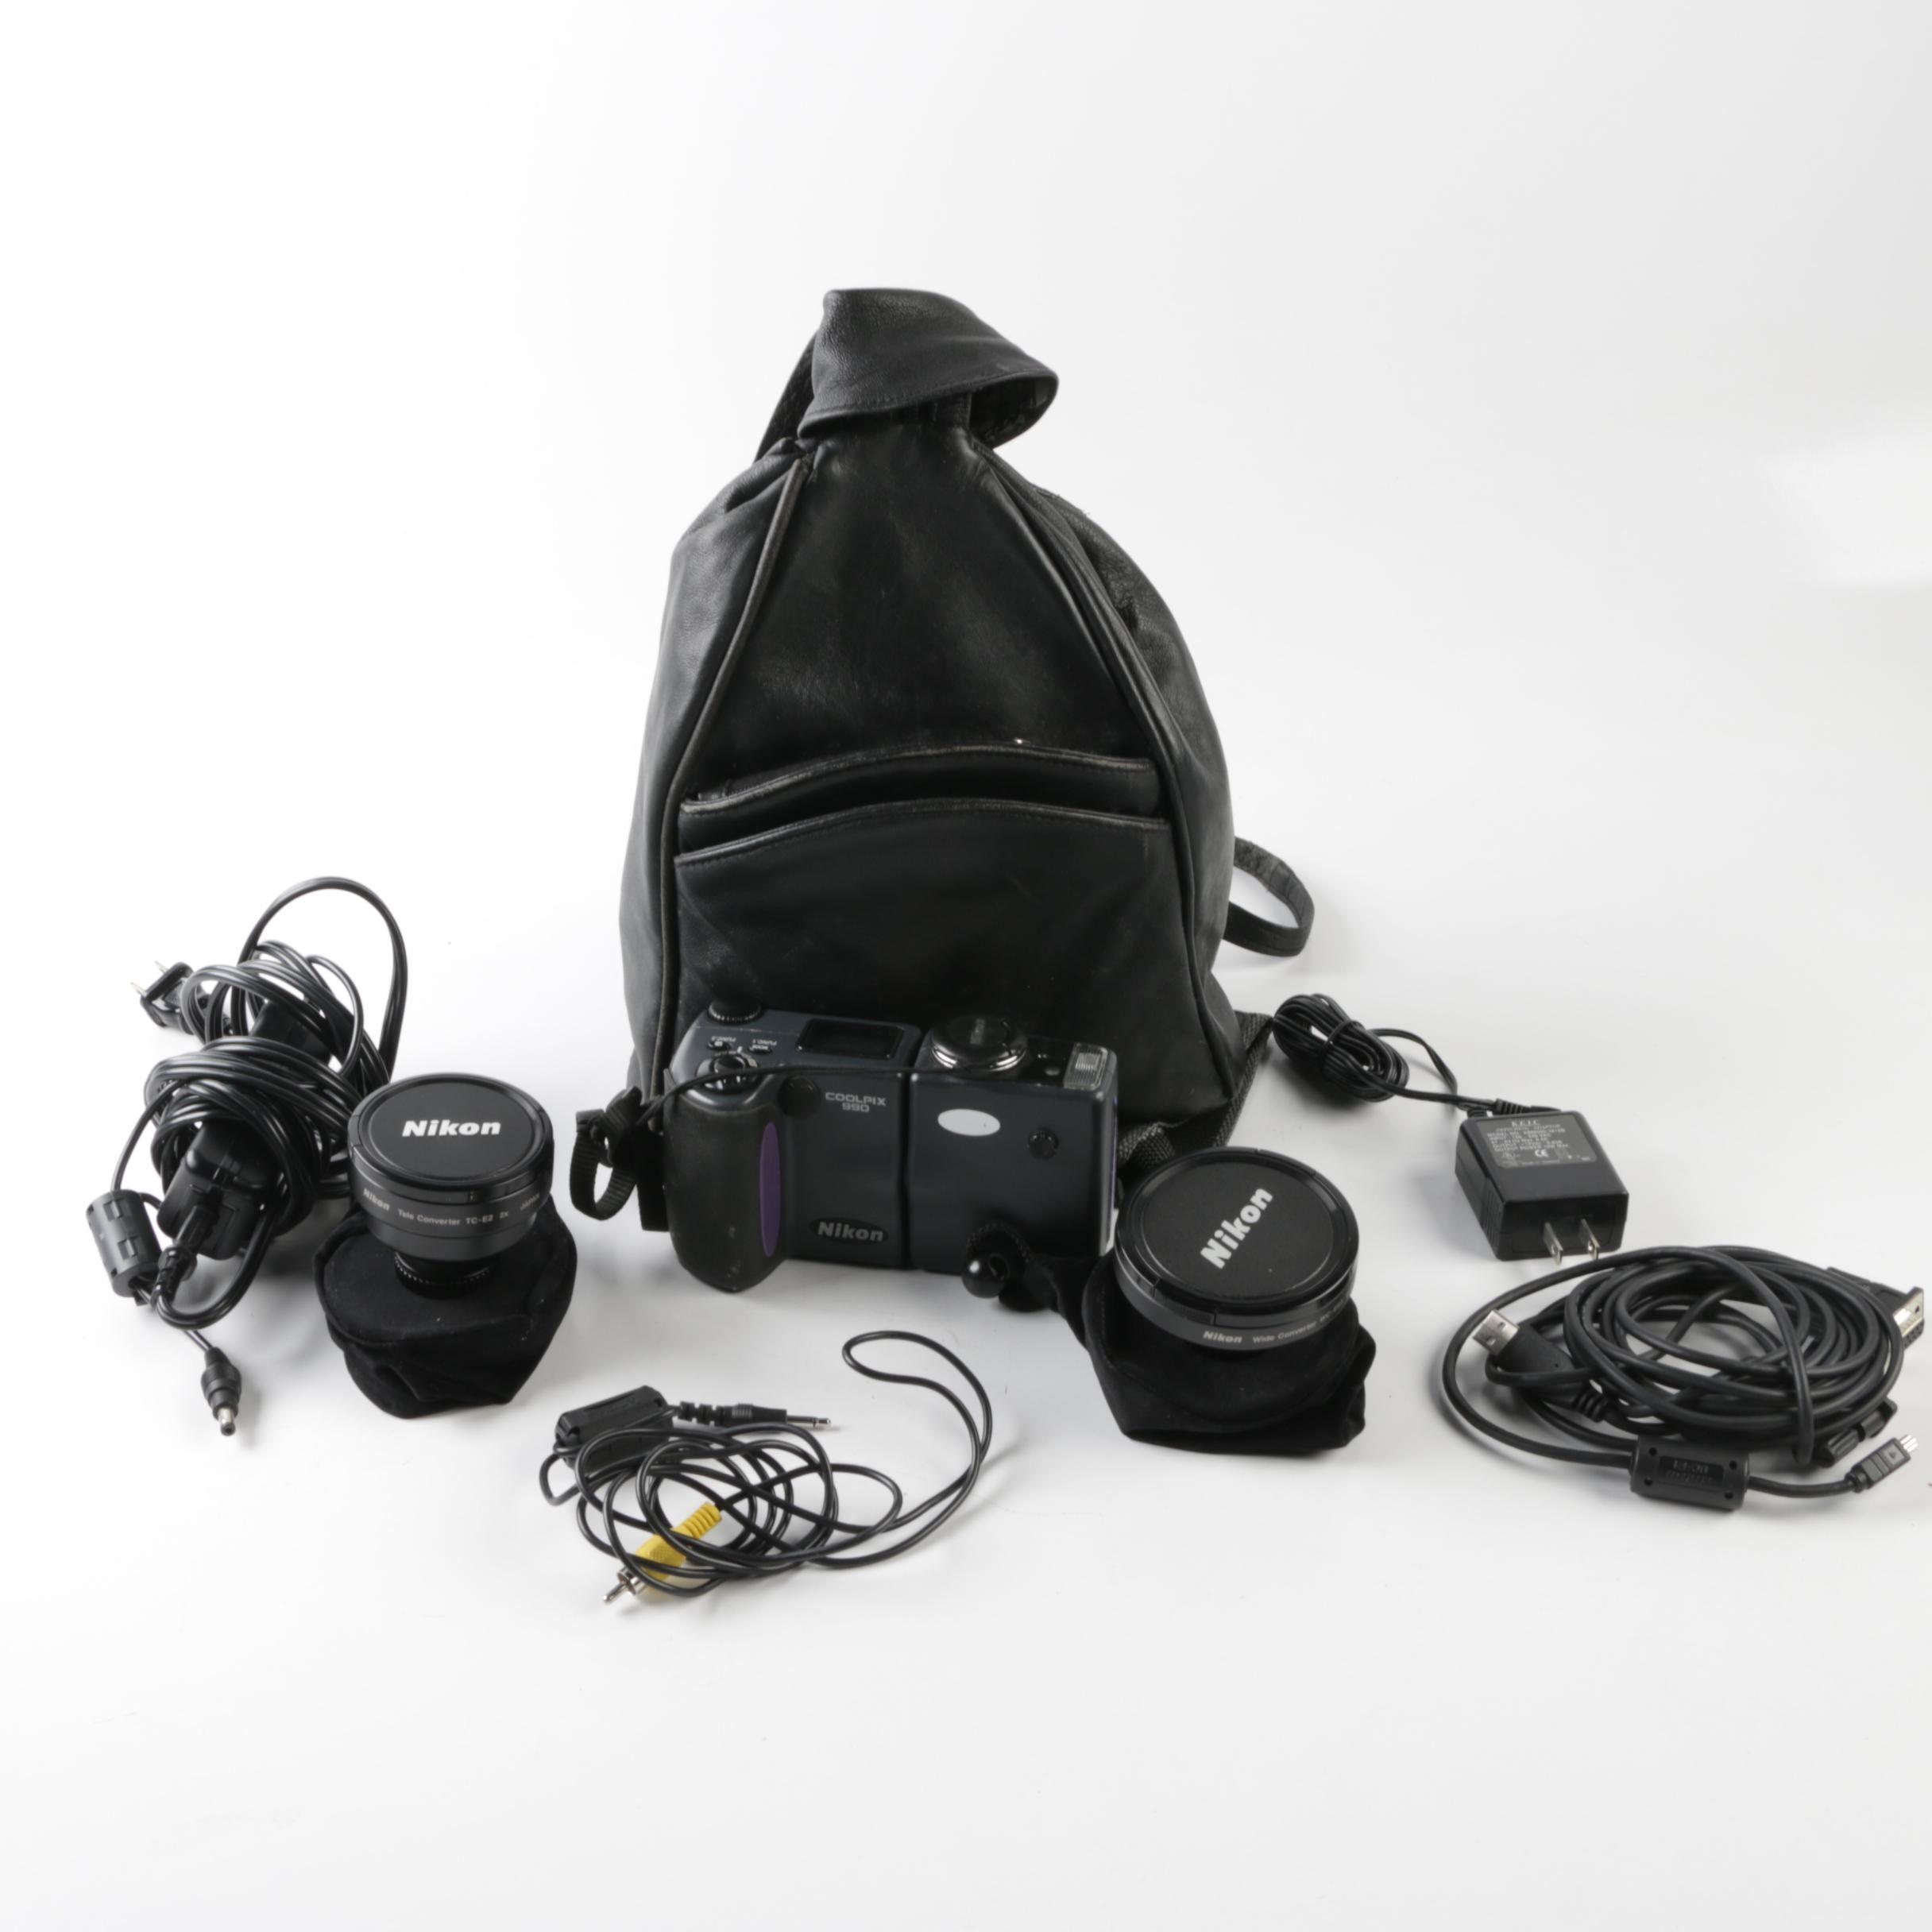 Nikon Coolpix 990 Digital Camera with Accessories